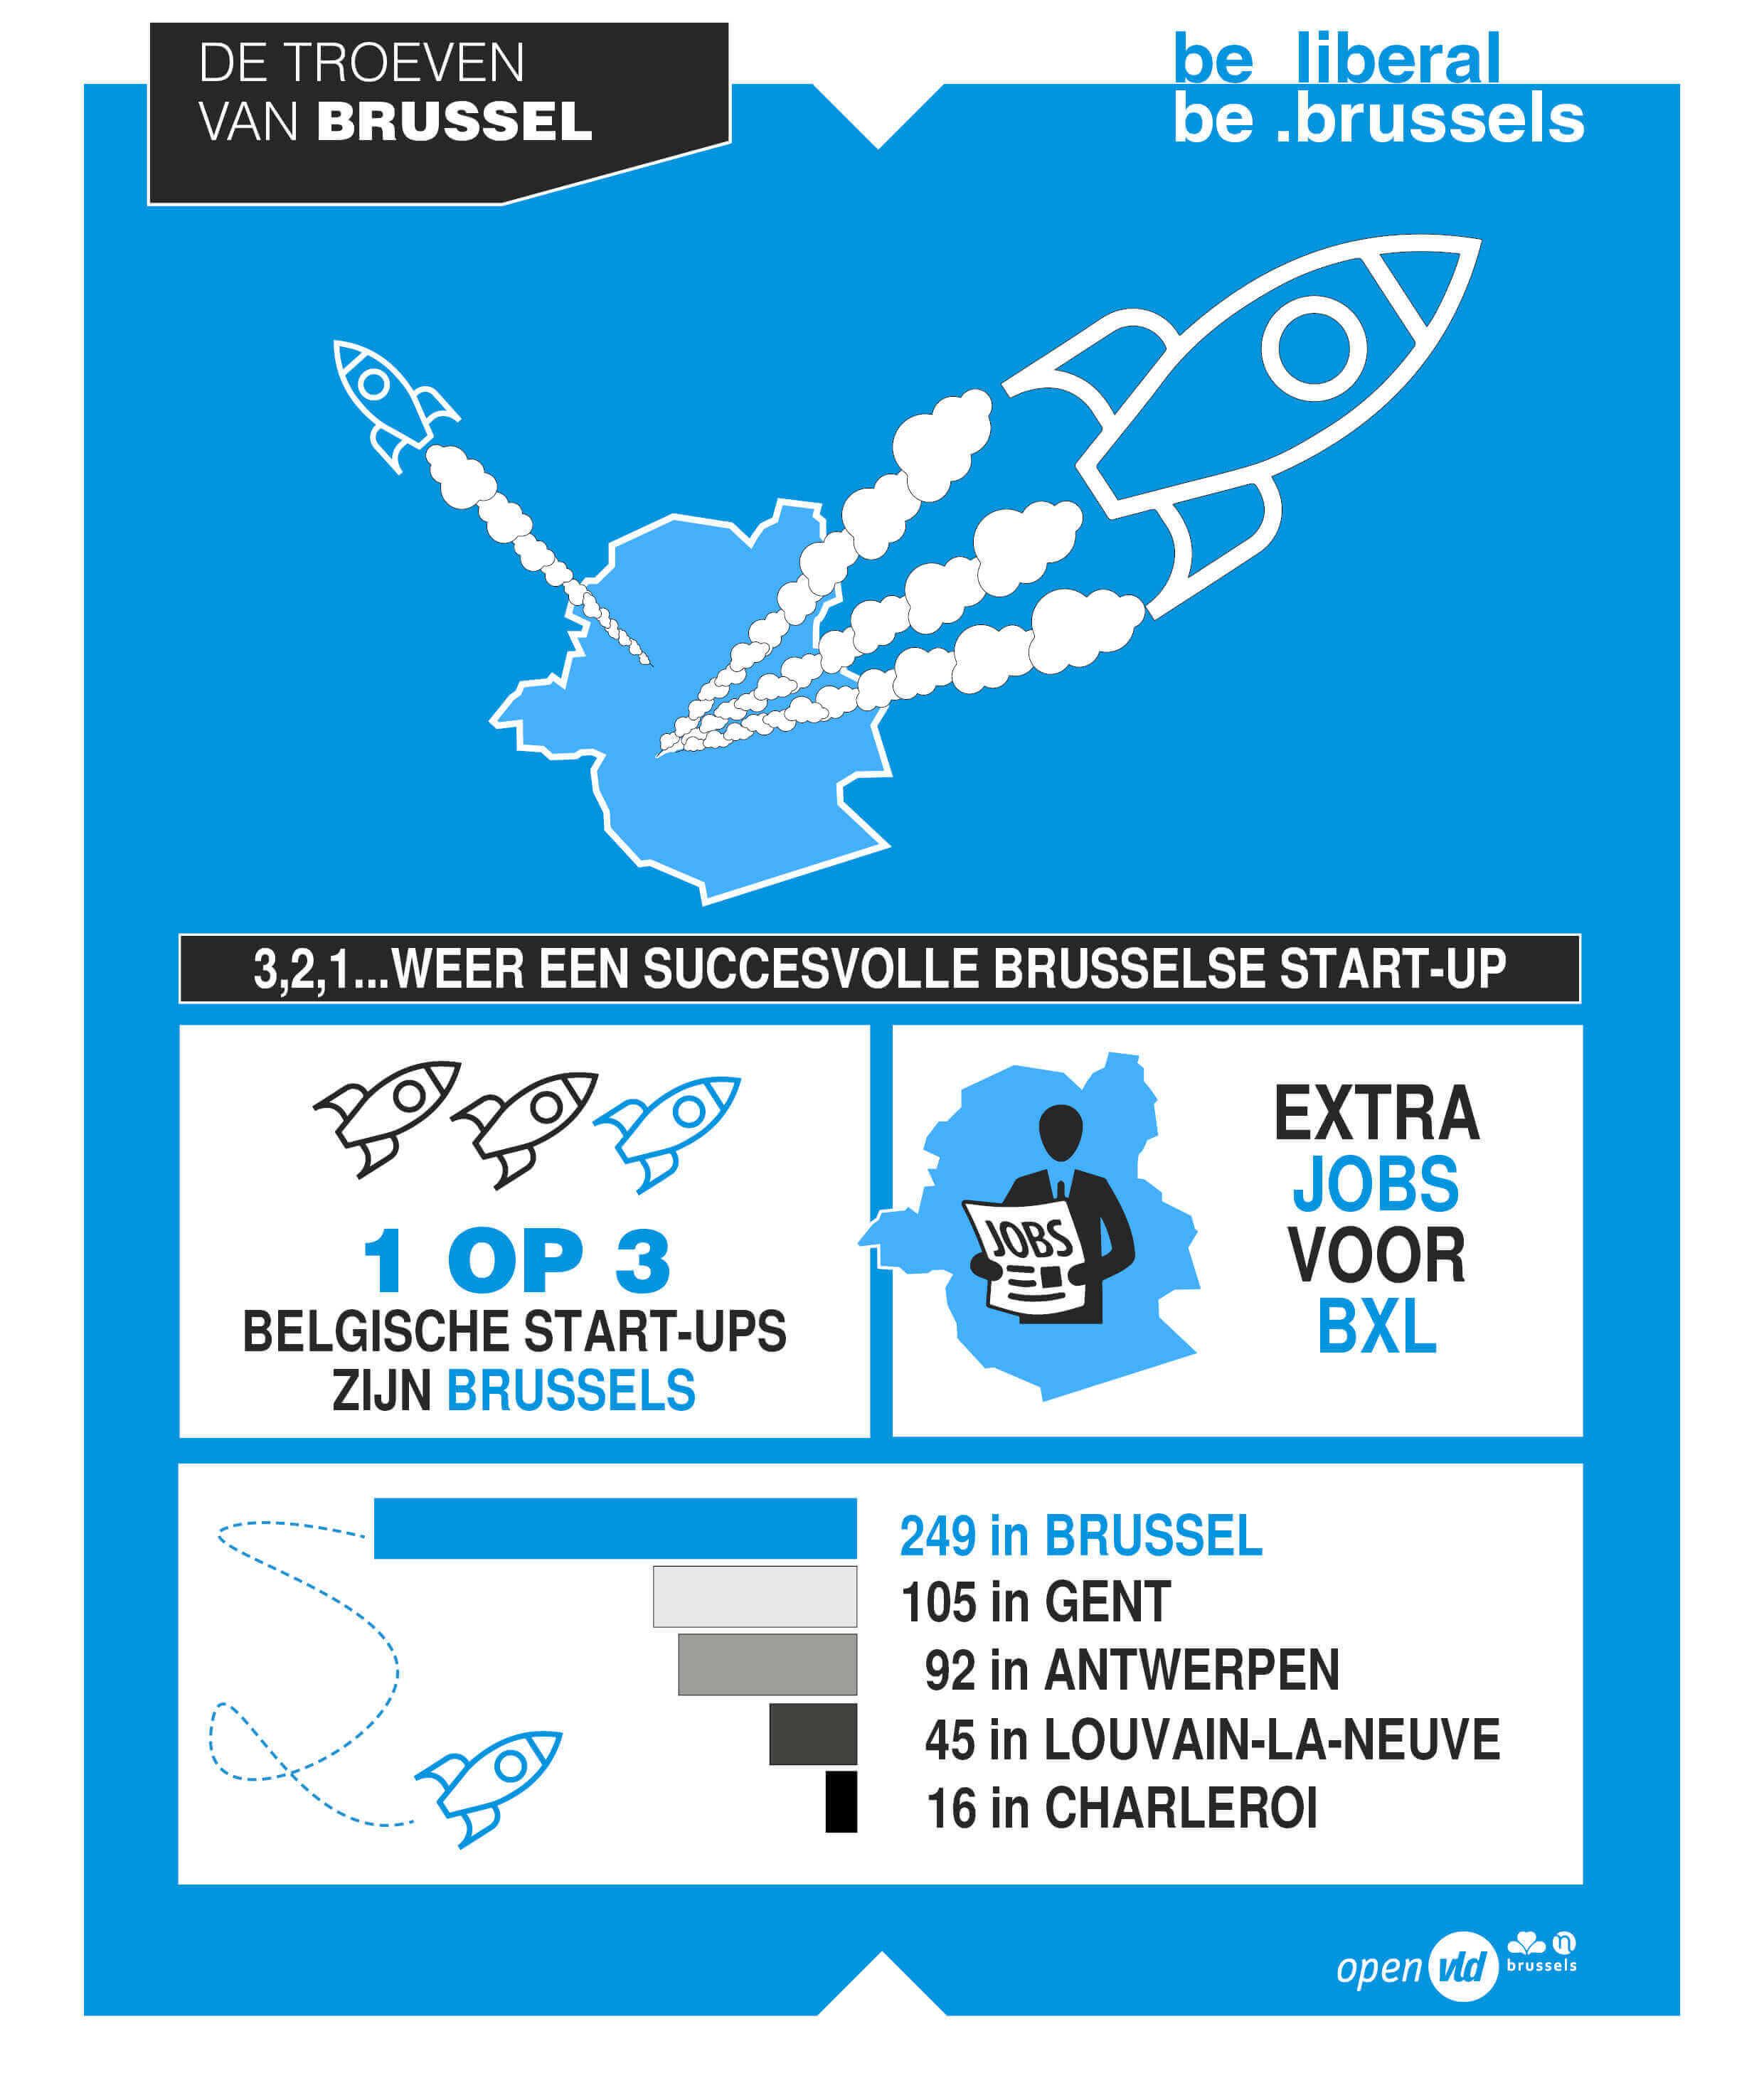 Brussel is koploper qua start-ups